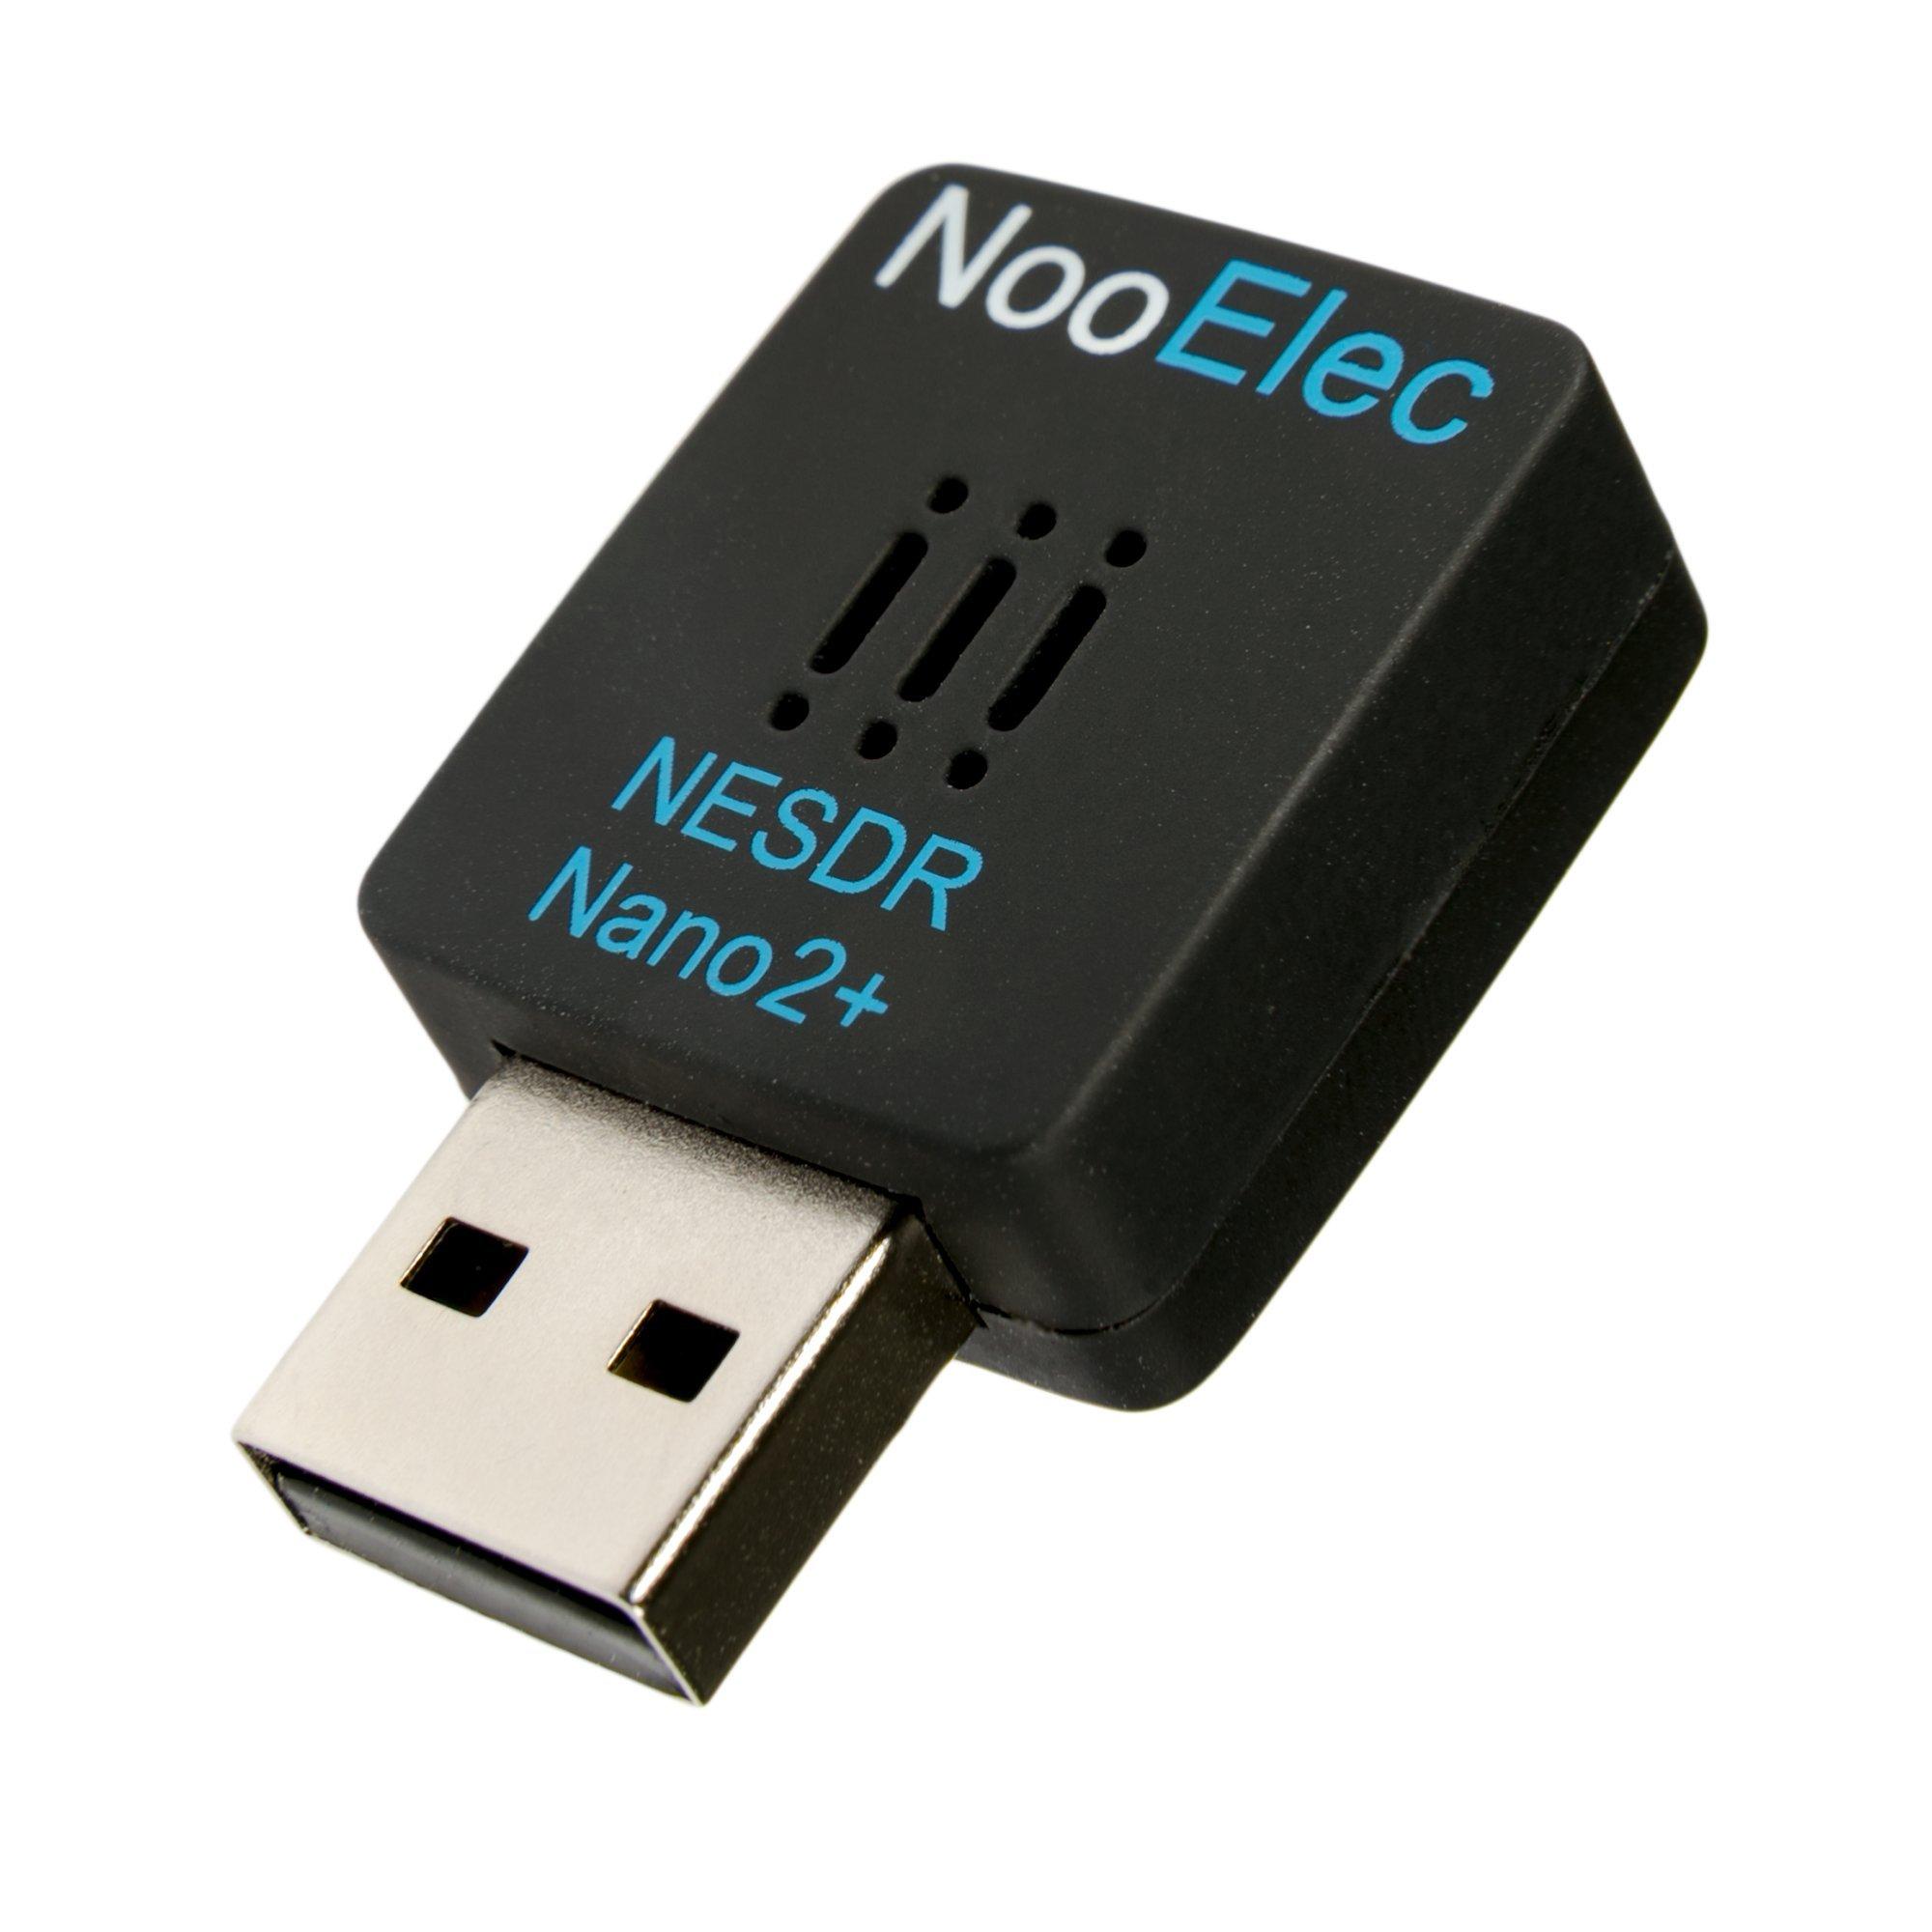 NESDR Nano 2+ Tiny Black RTL-SDR USB Set (RTL2832U + R820T2) con ruido de fase ultrabaja 0.5PPM TCXO y antena MCX. Radio definida por software, compatible con DVB-T y ADS-B, ESD Safe: